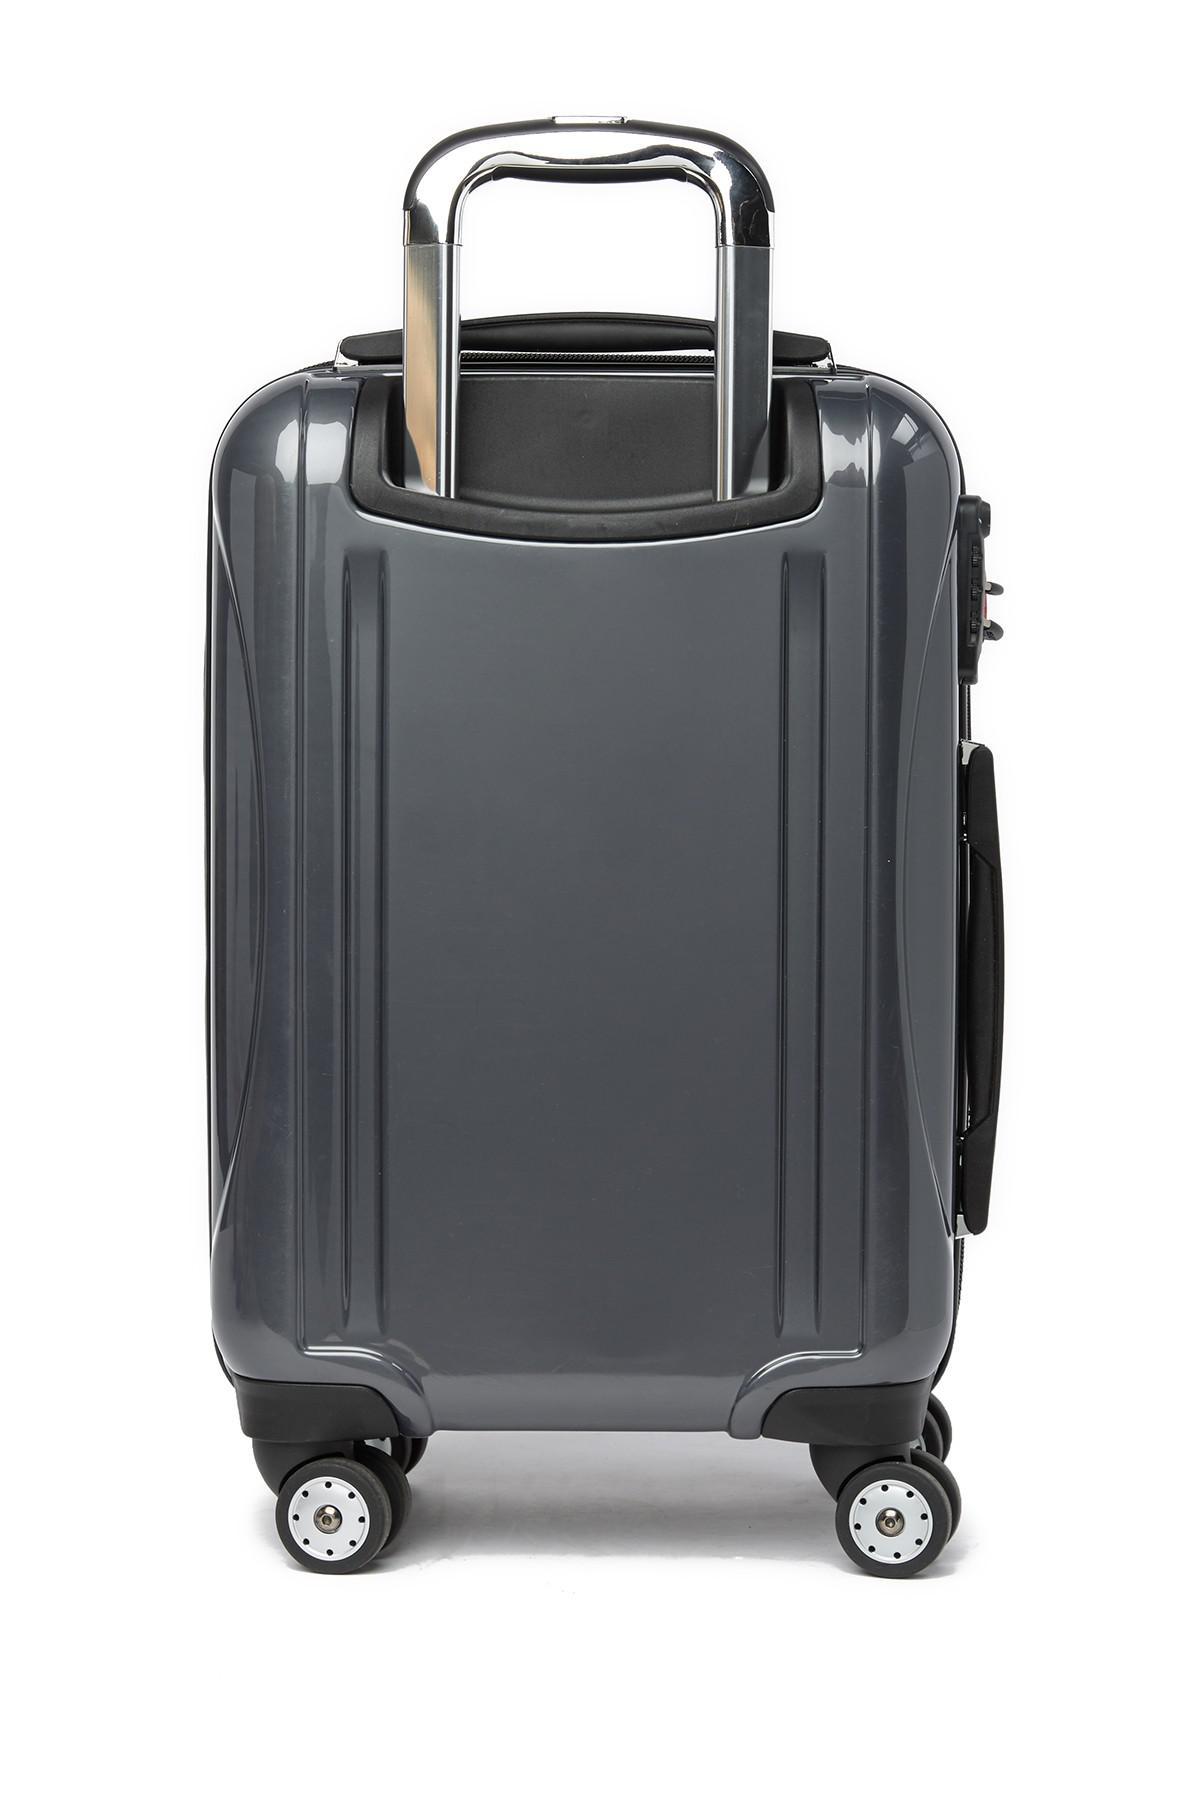 a20e7d901 Lyst - Delsey Helium Aero International Carry-on Spinner for Men